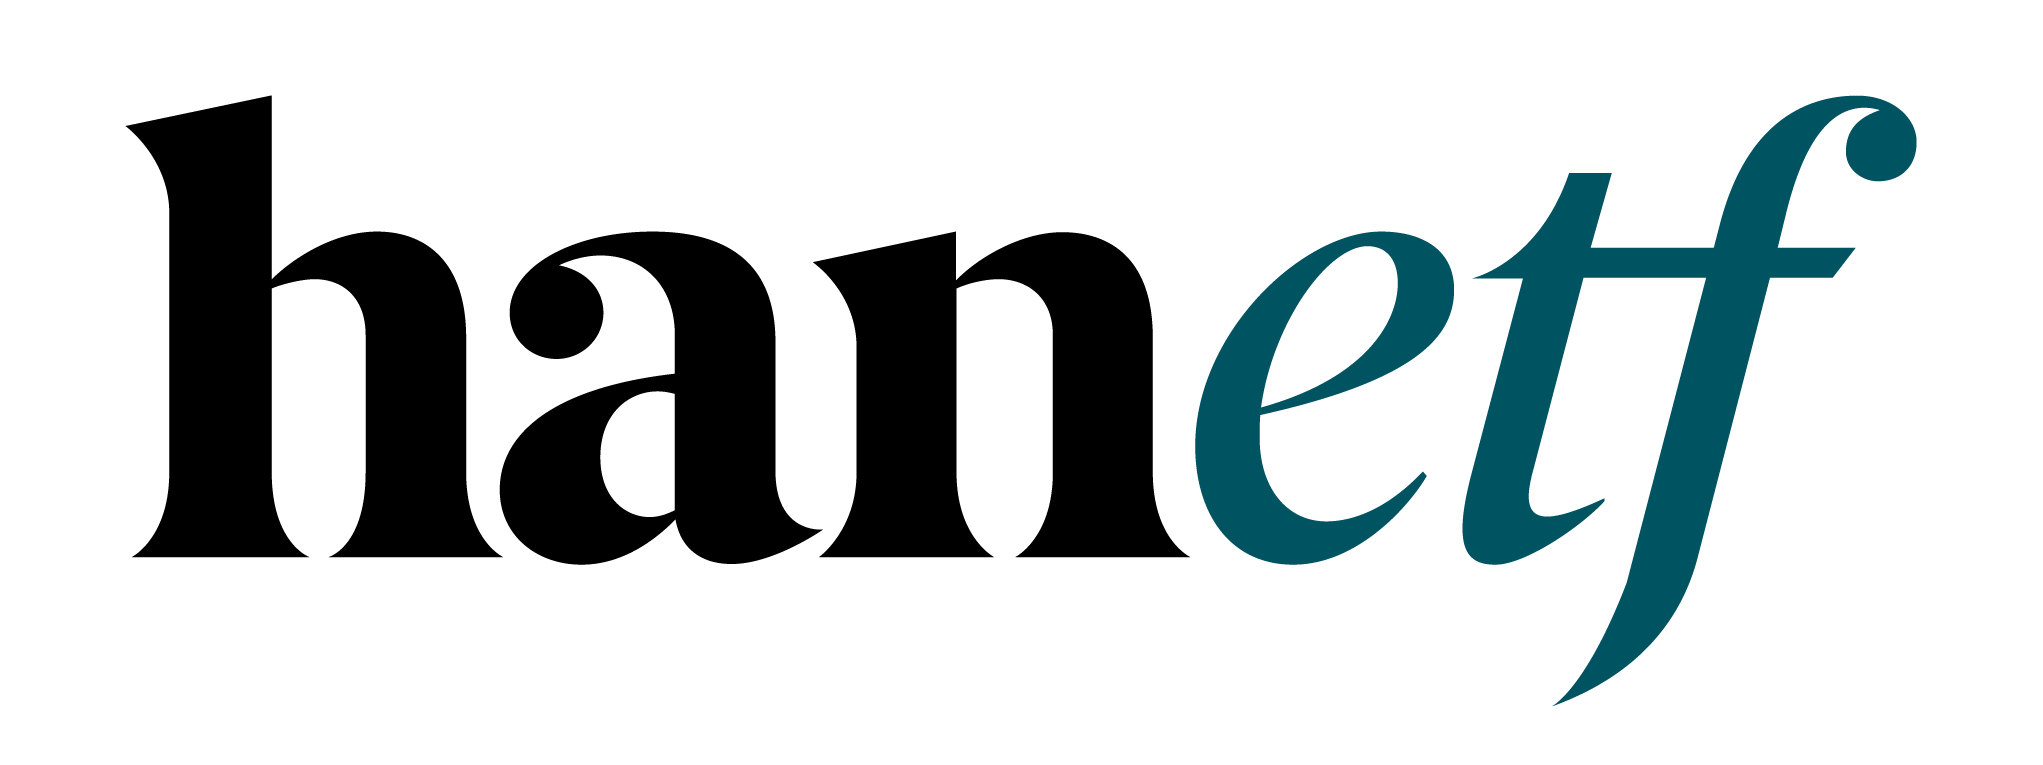 HANETF ICAV Logo